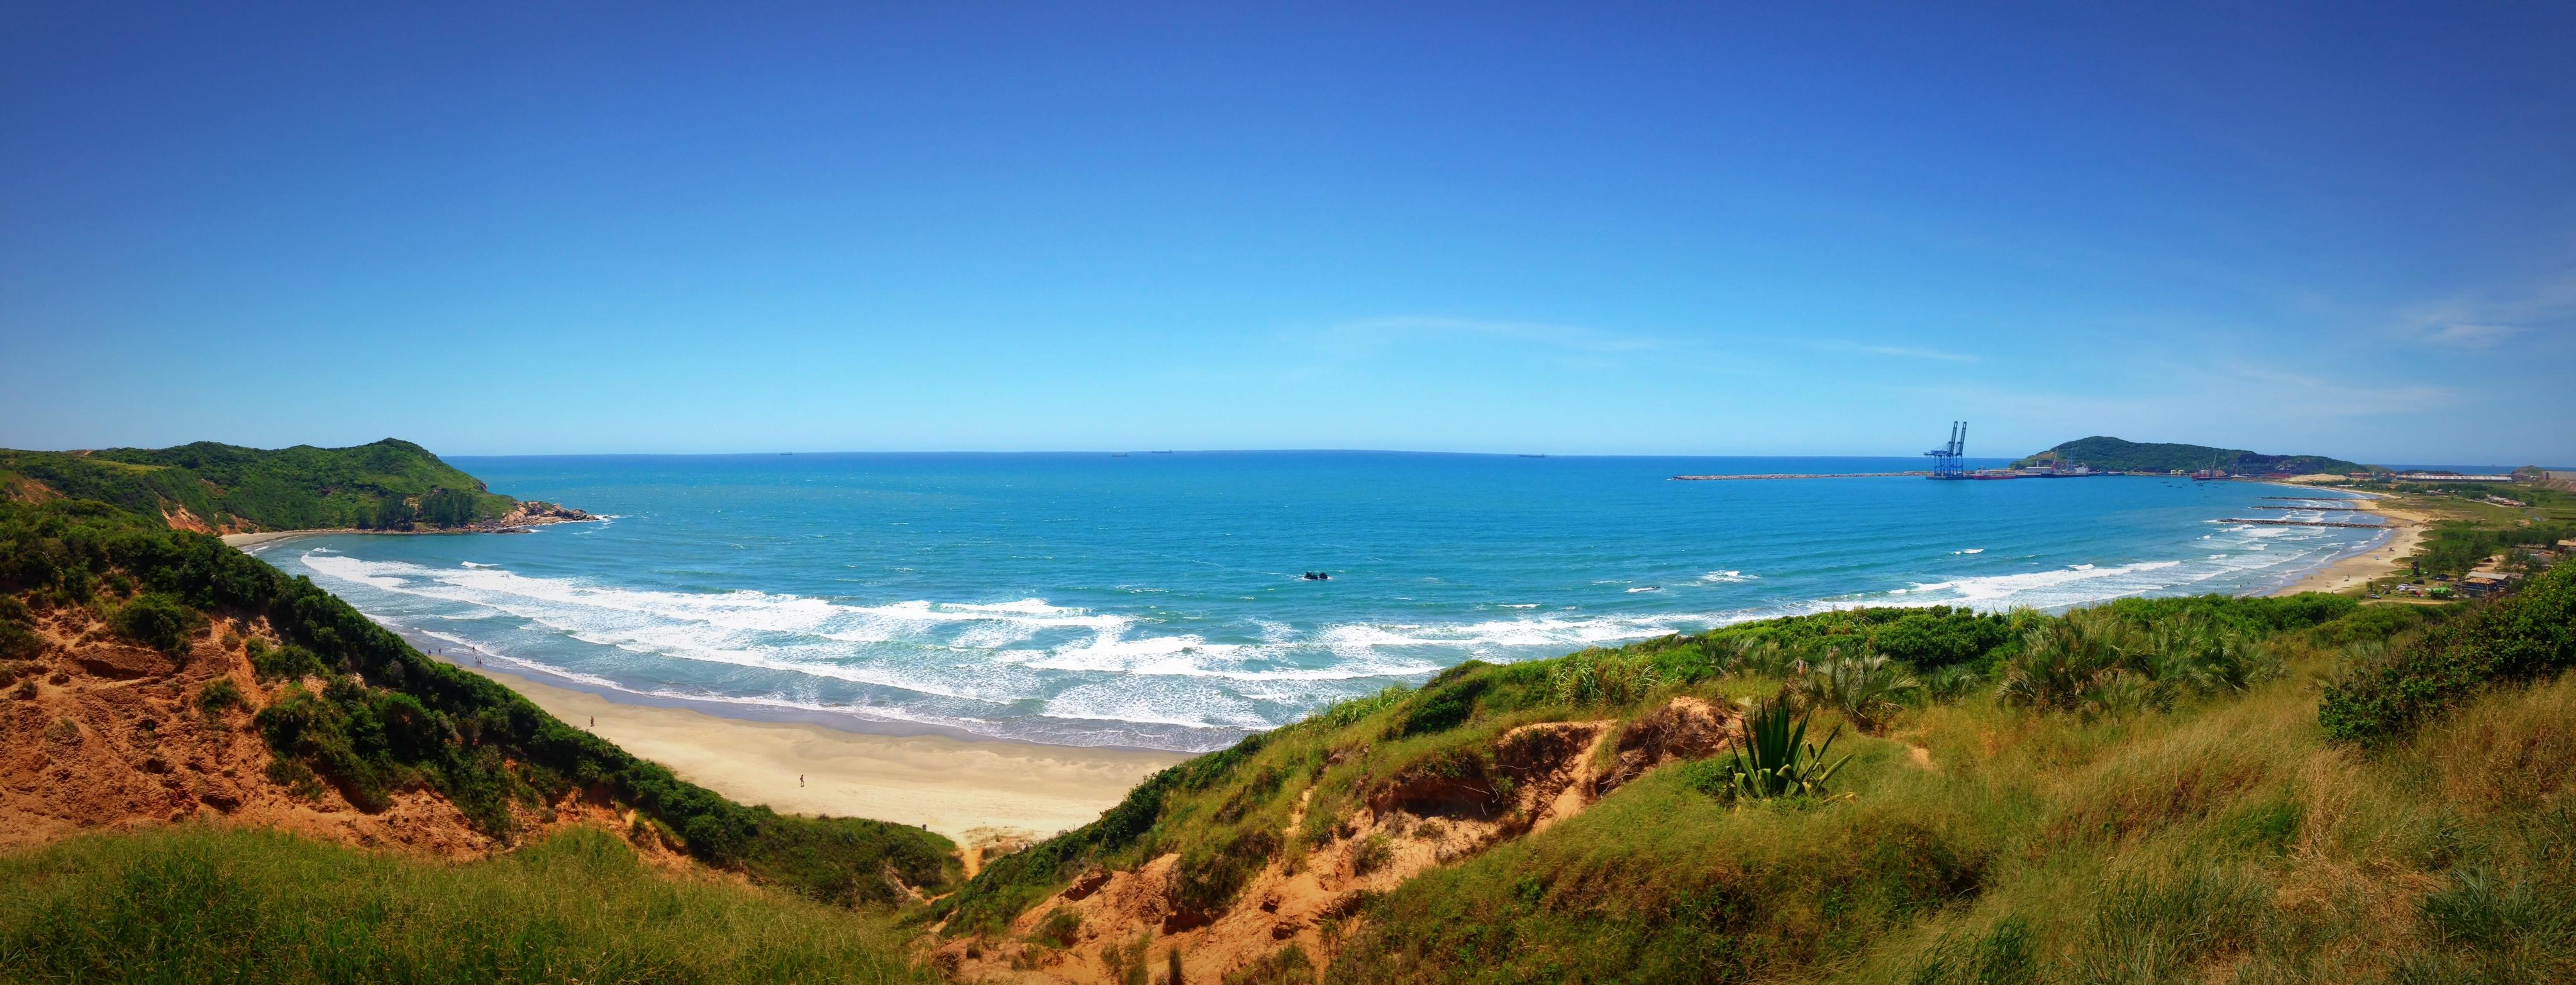 A panoramic view of Porto Beach (Praia do Porto) - Imbituba, SC, Brazil, Beach, Port, South America, Shore, HQ Photo